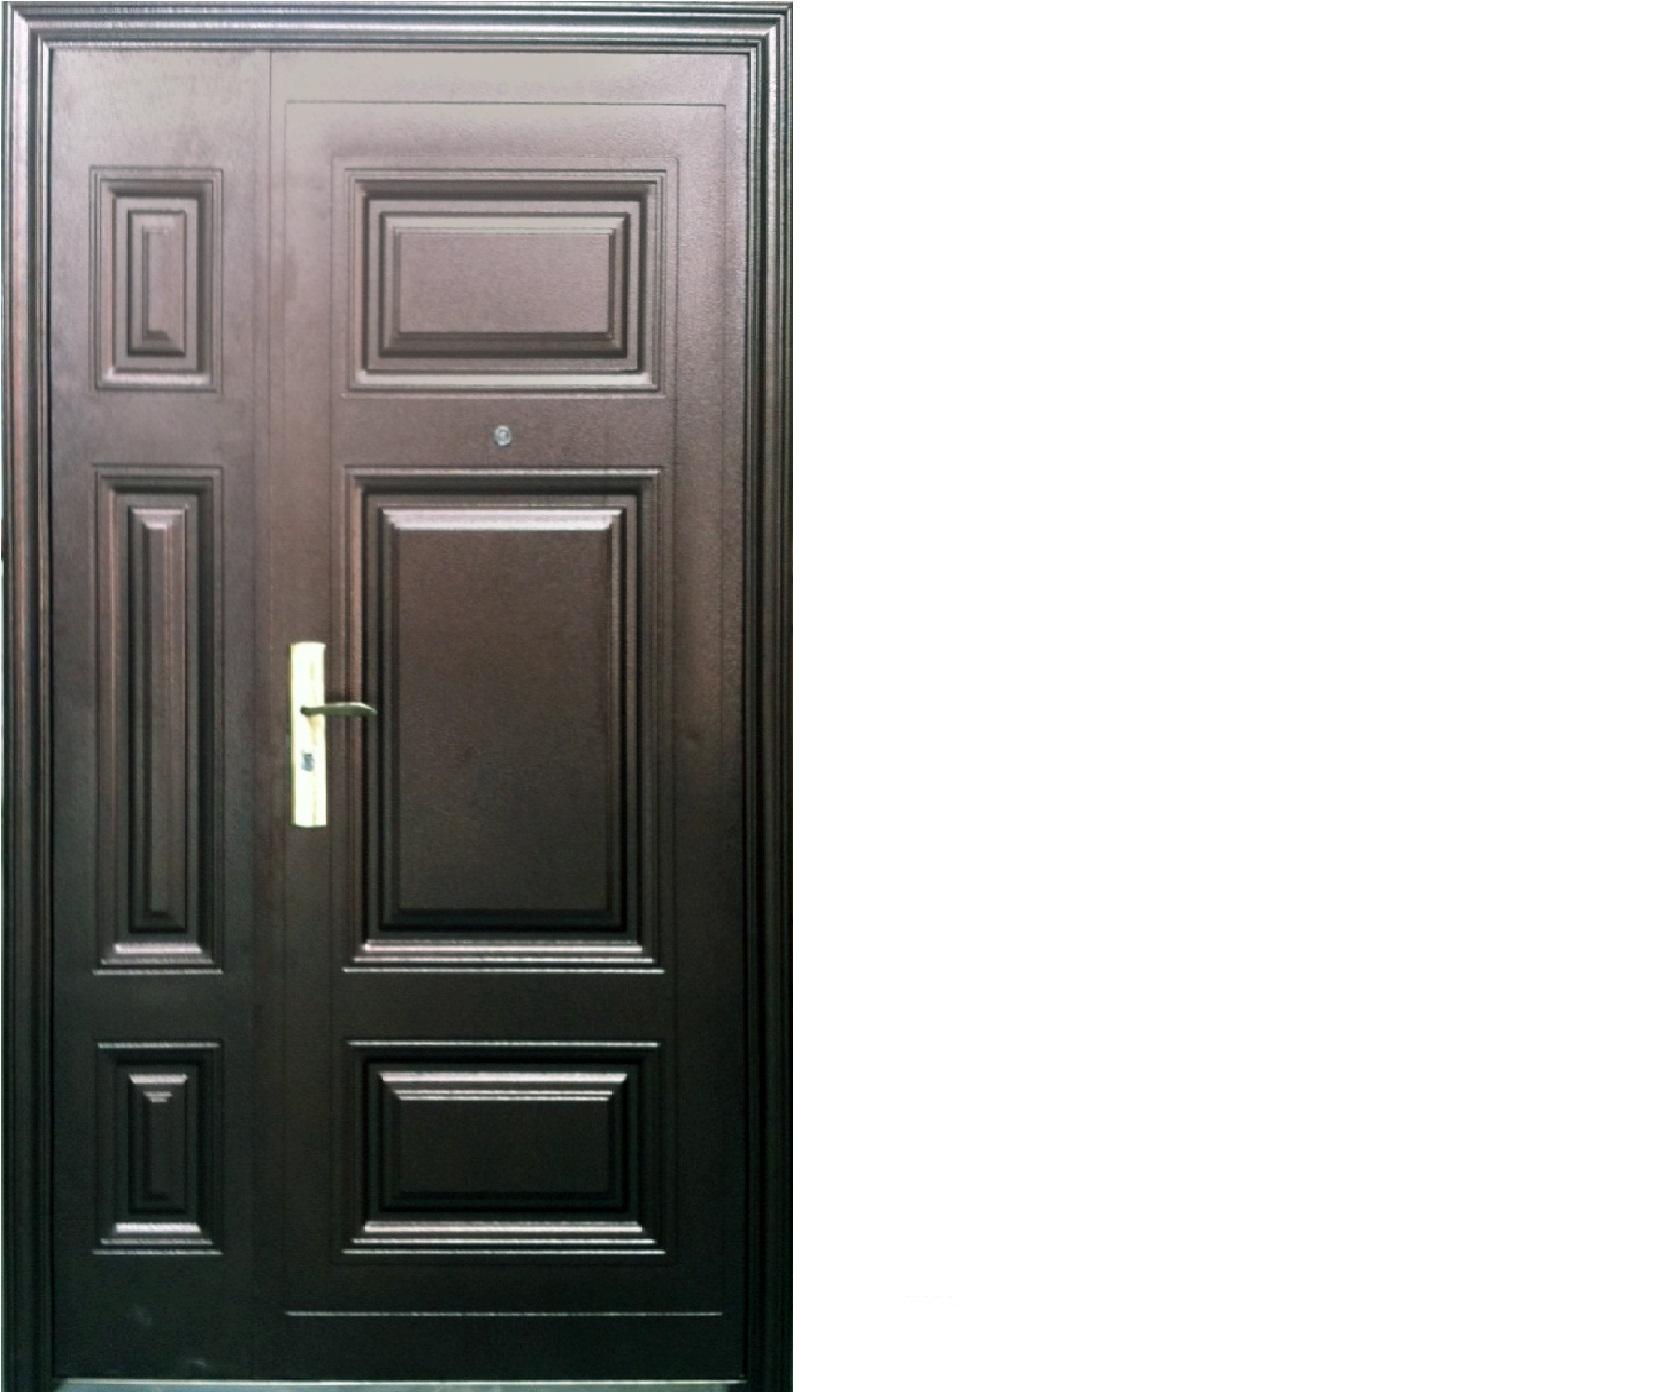 Дверь стальная двухстворчатая 2050х1200х70, модель К-311